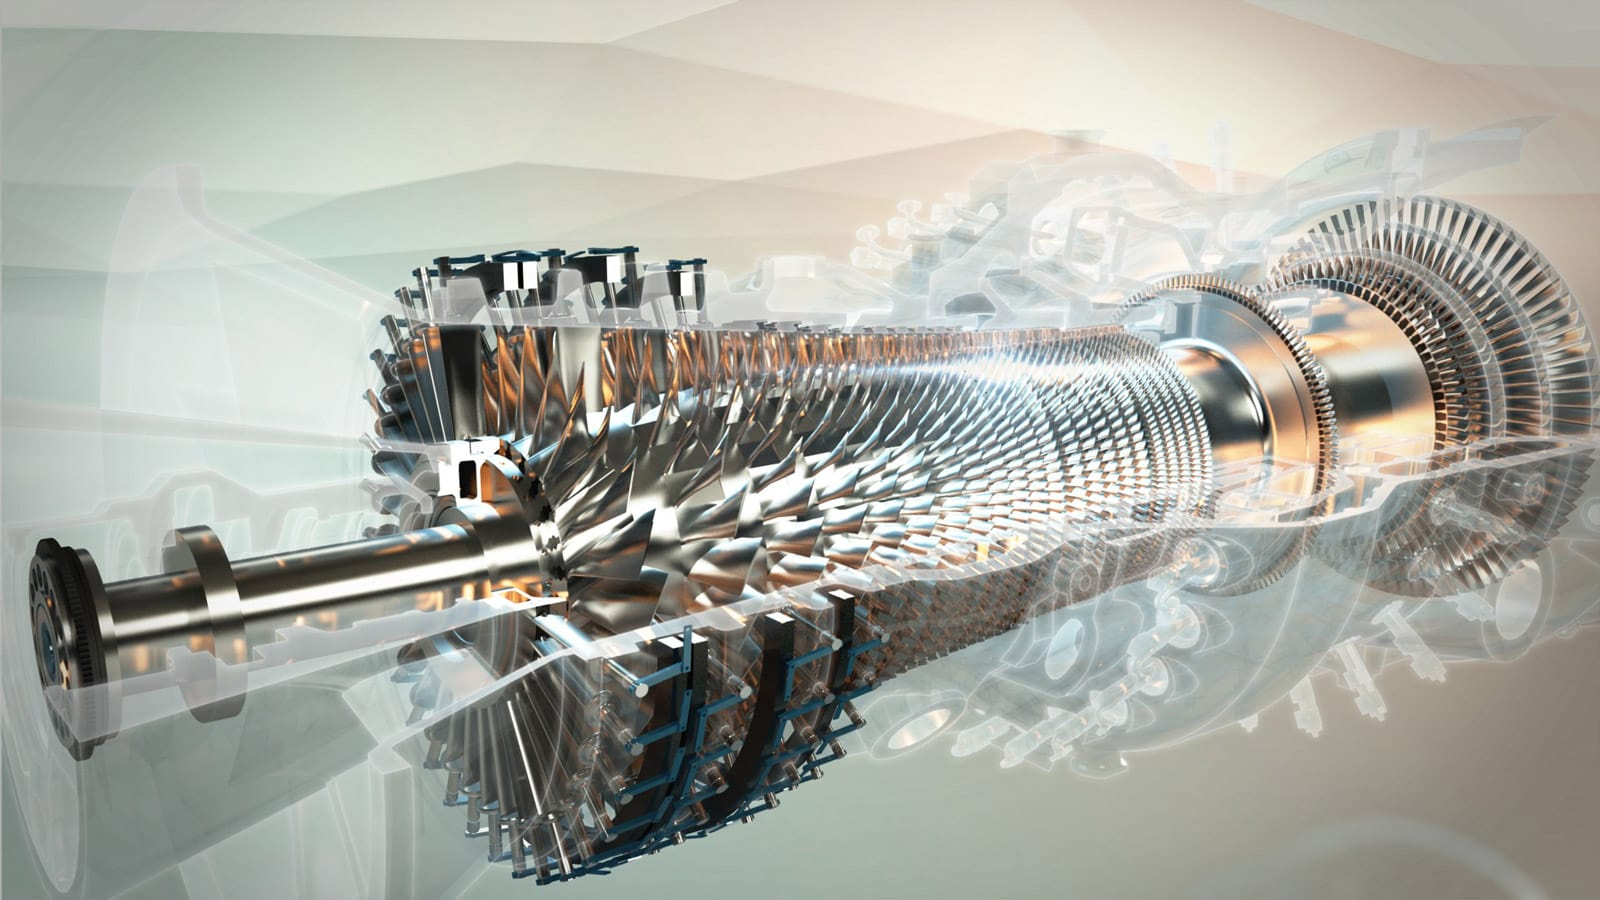 turbina - GE Nuovo Pignone (Нуово Пиньоне) компрессоры, турбины